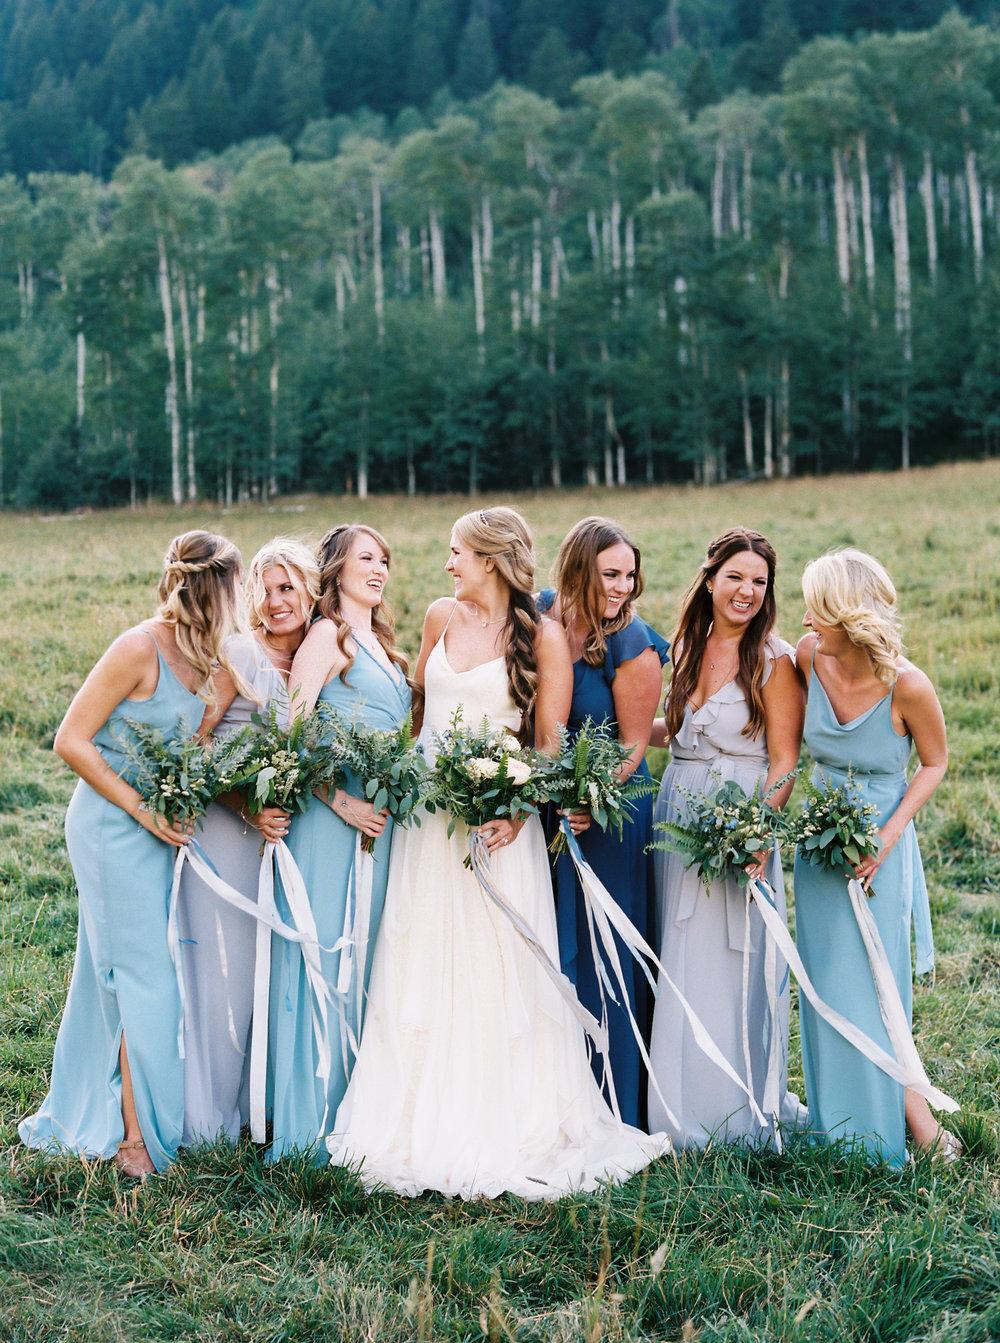 ashley-sawtelle-aspen-wedding-photographer-0024.jpg